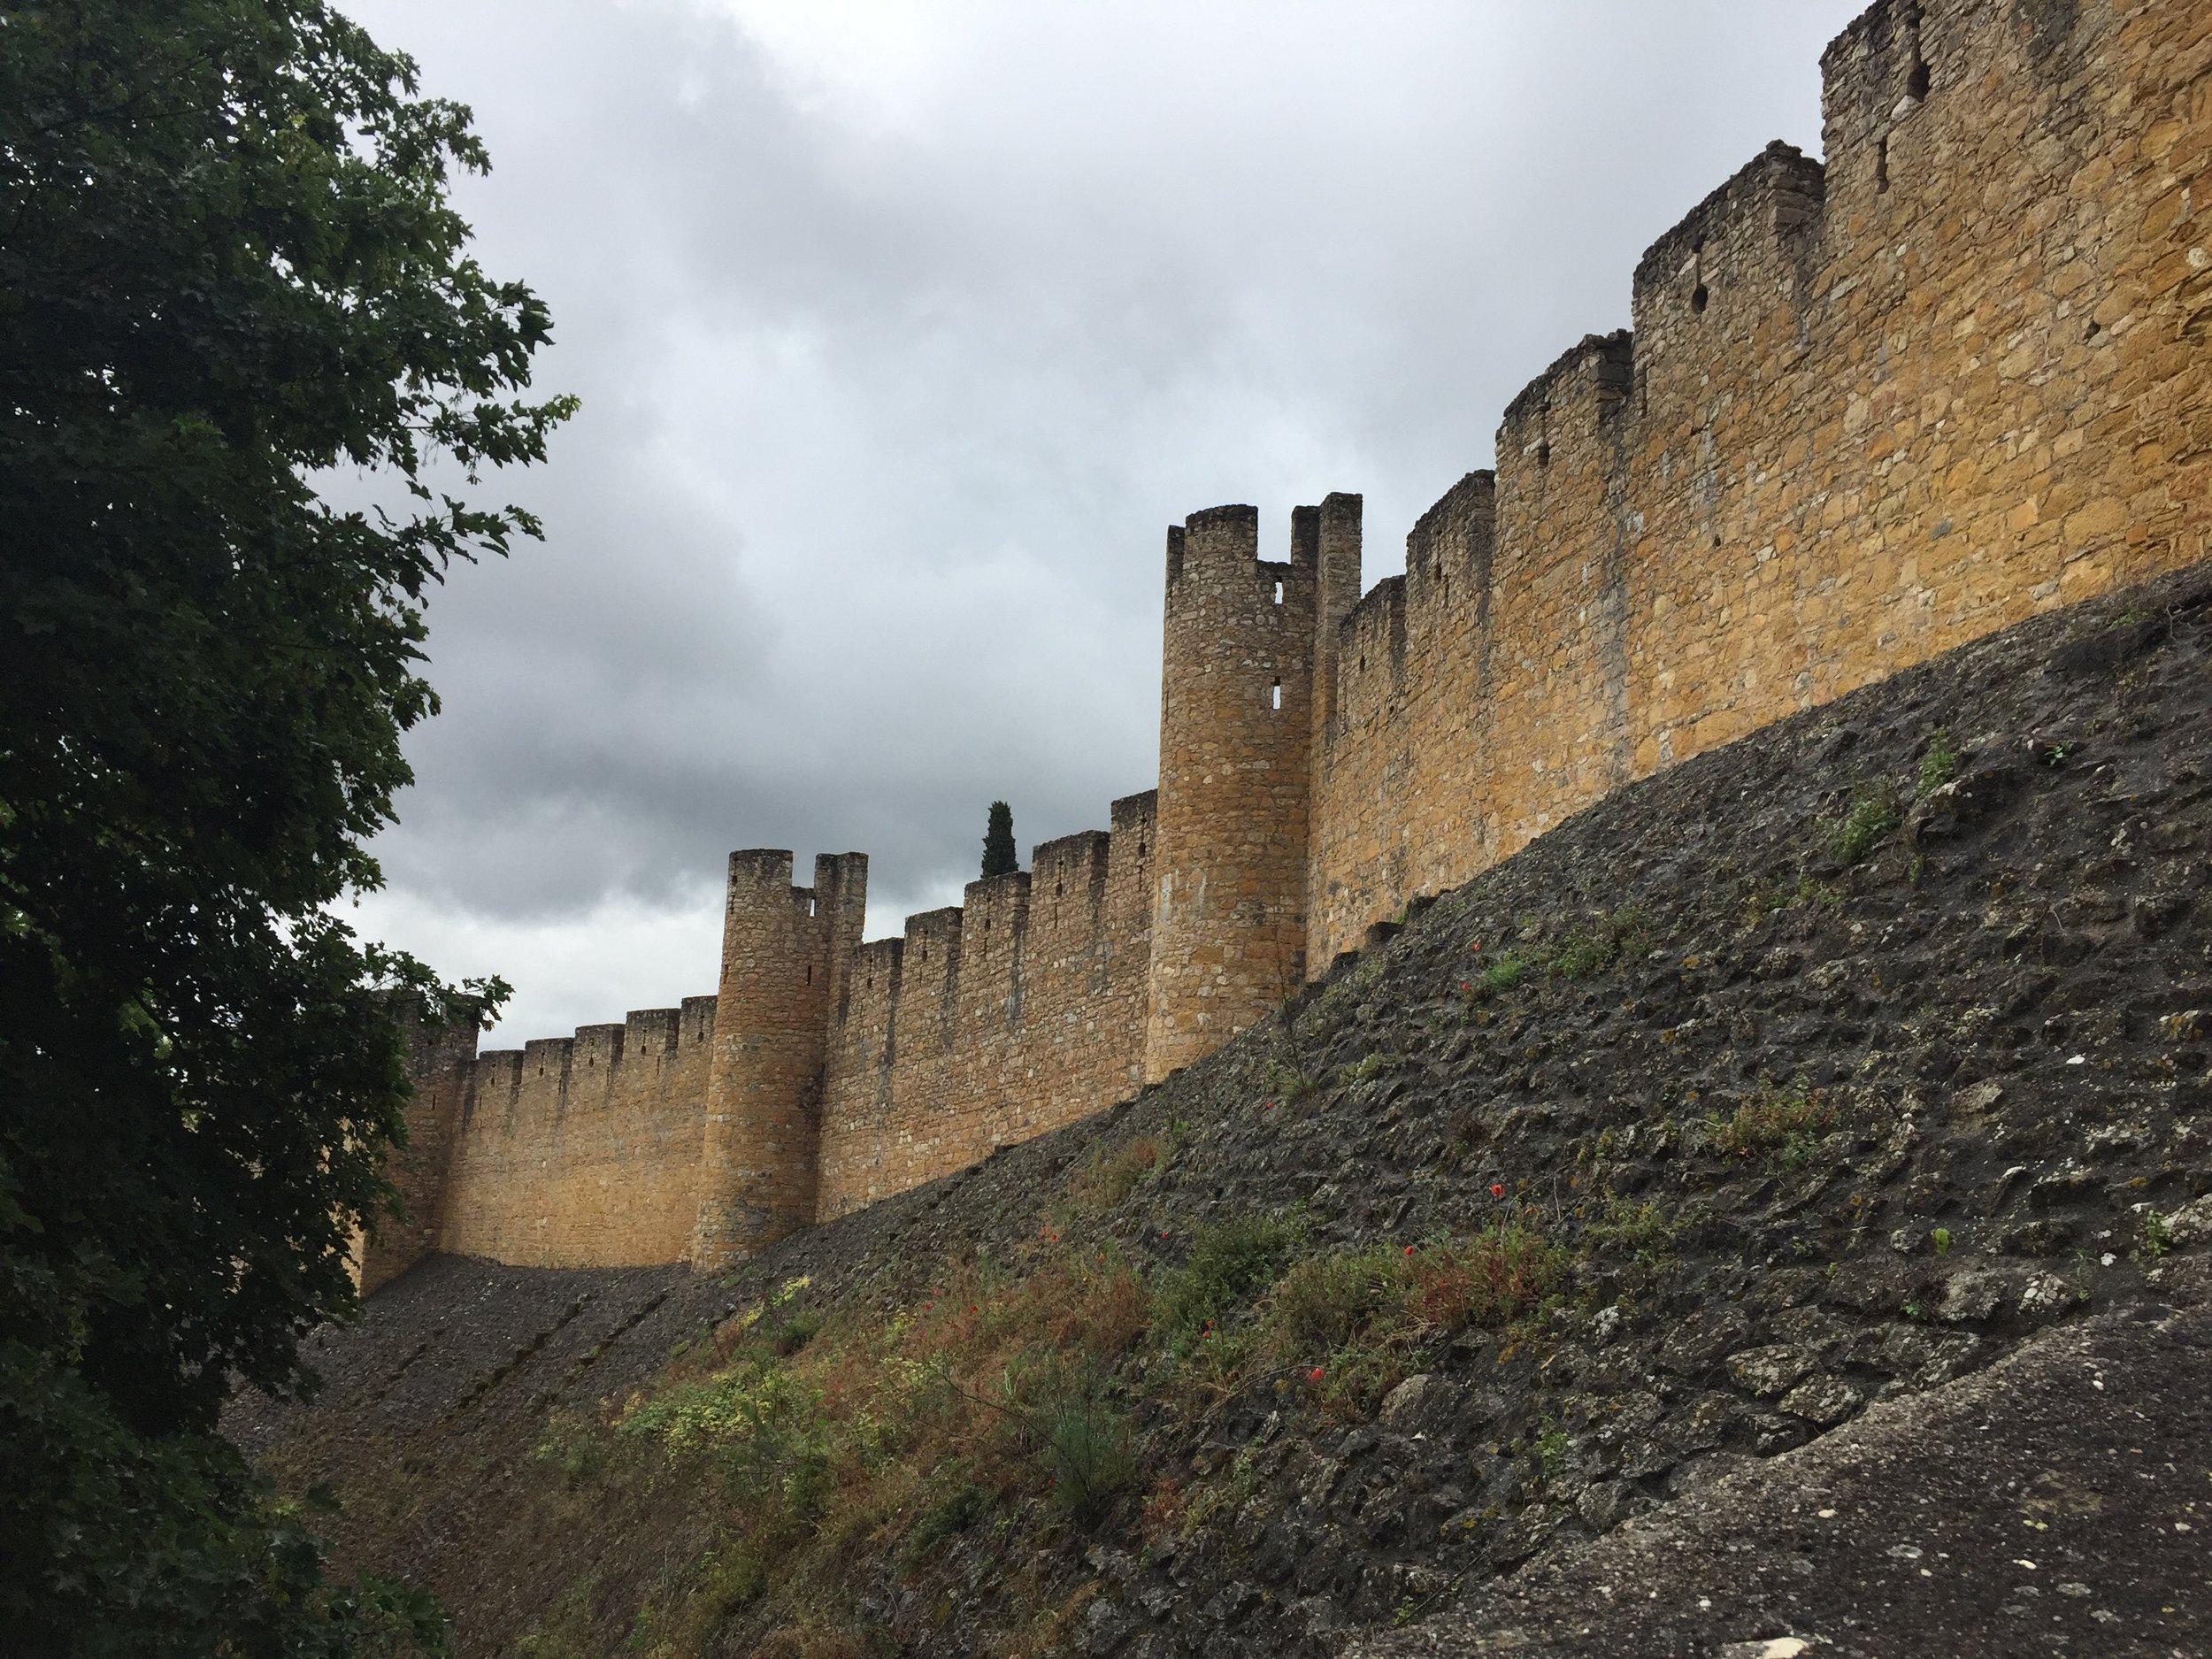 Imponente muralha do Convento de Cristo abraça a mata ao seu redor.